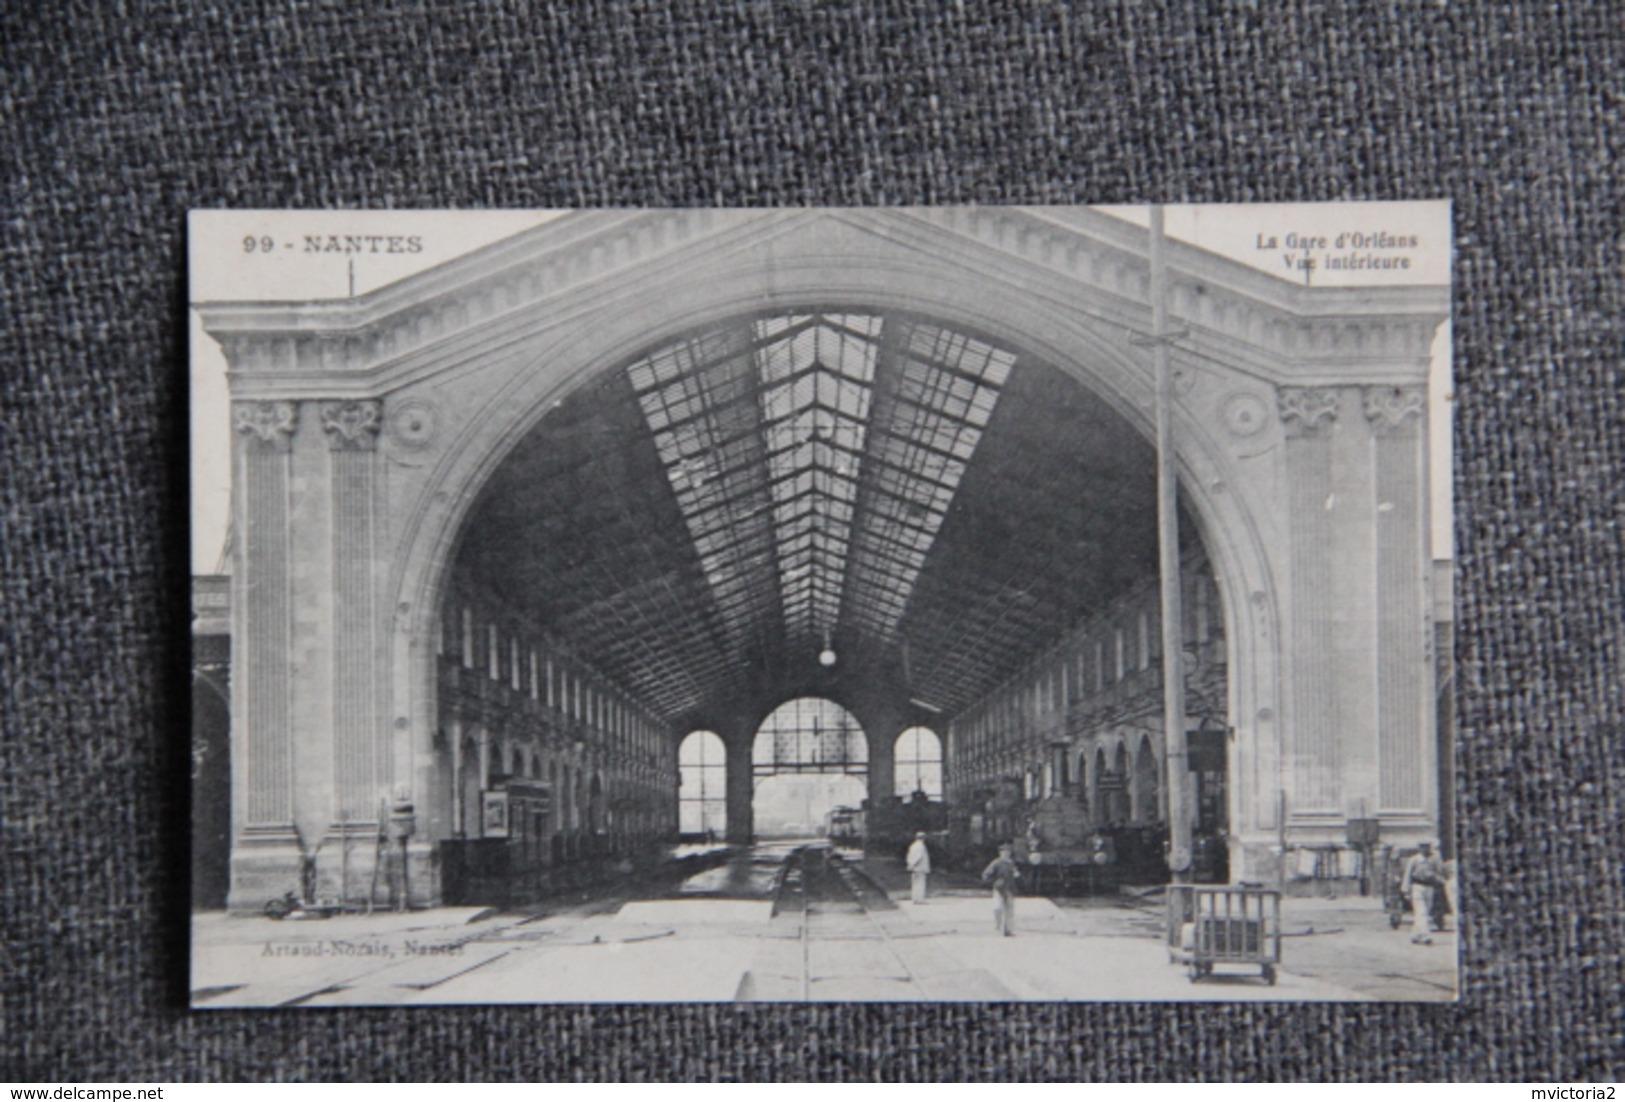 NANTES - La Gare D'ORLEANS - Nantes